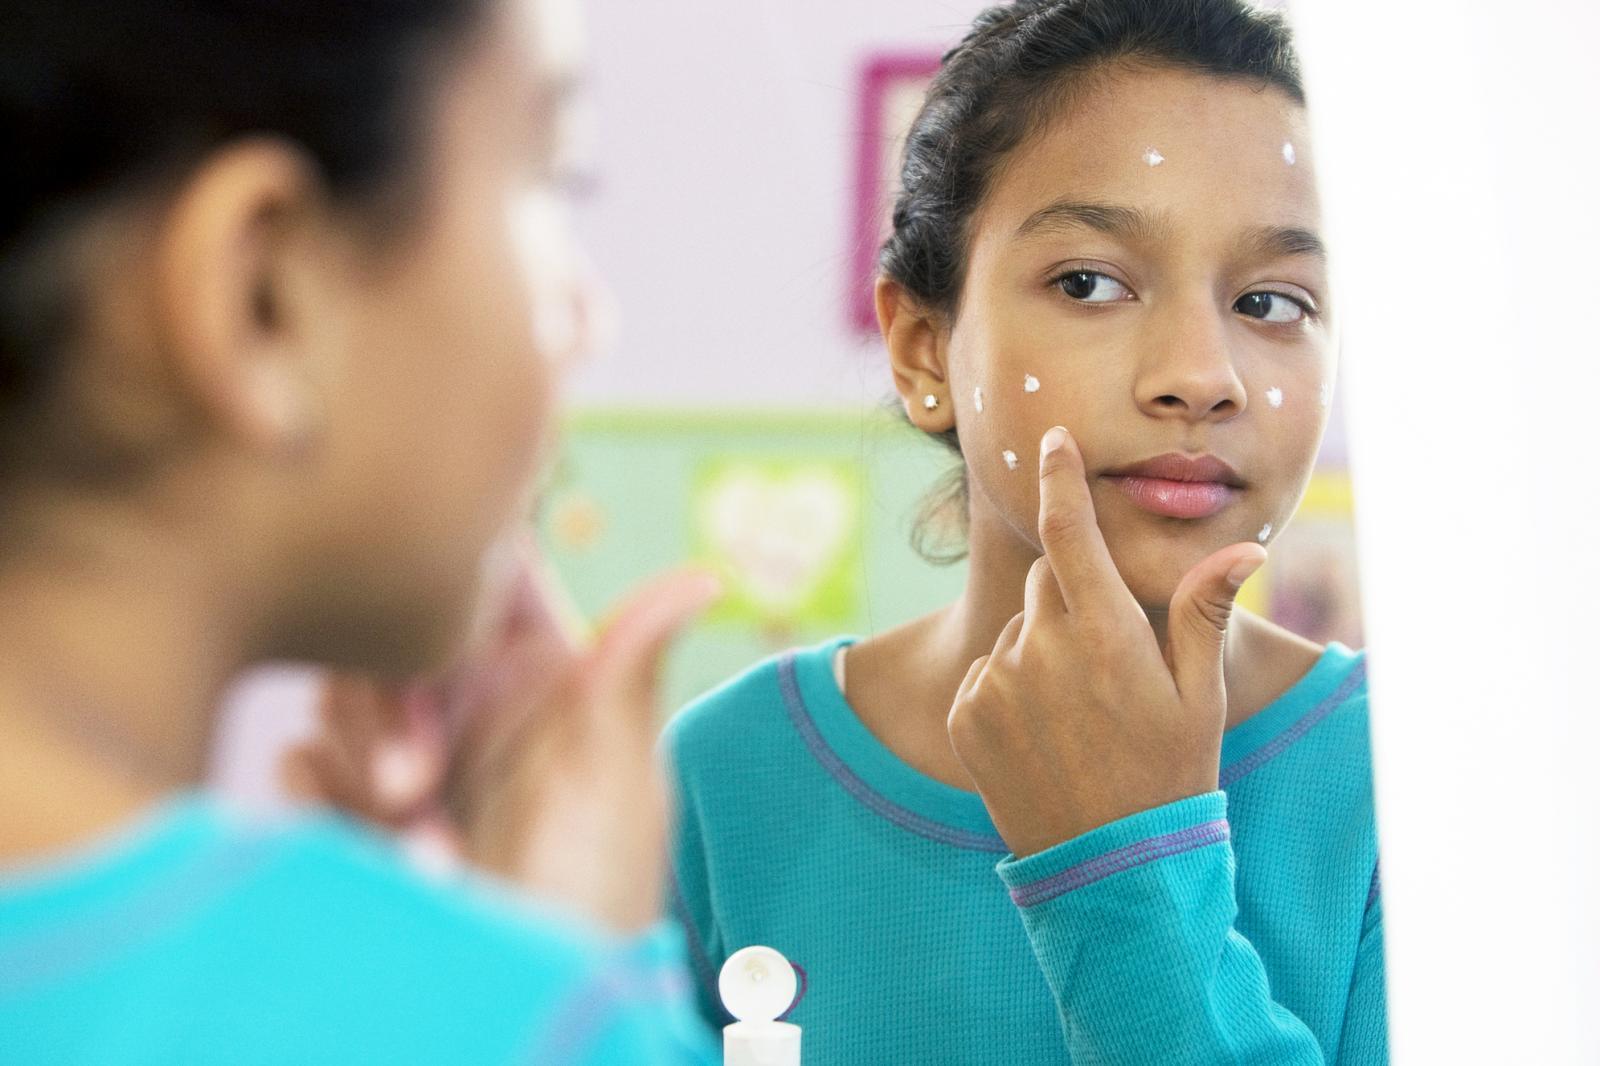 Free samples of acne medicine | lovetoknow.